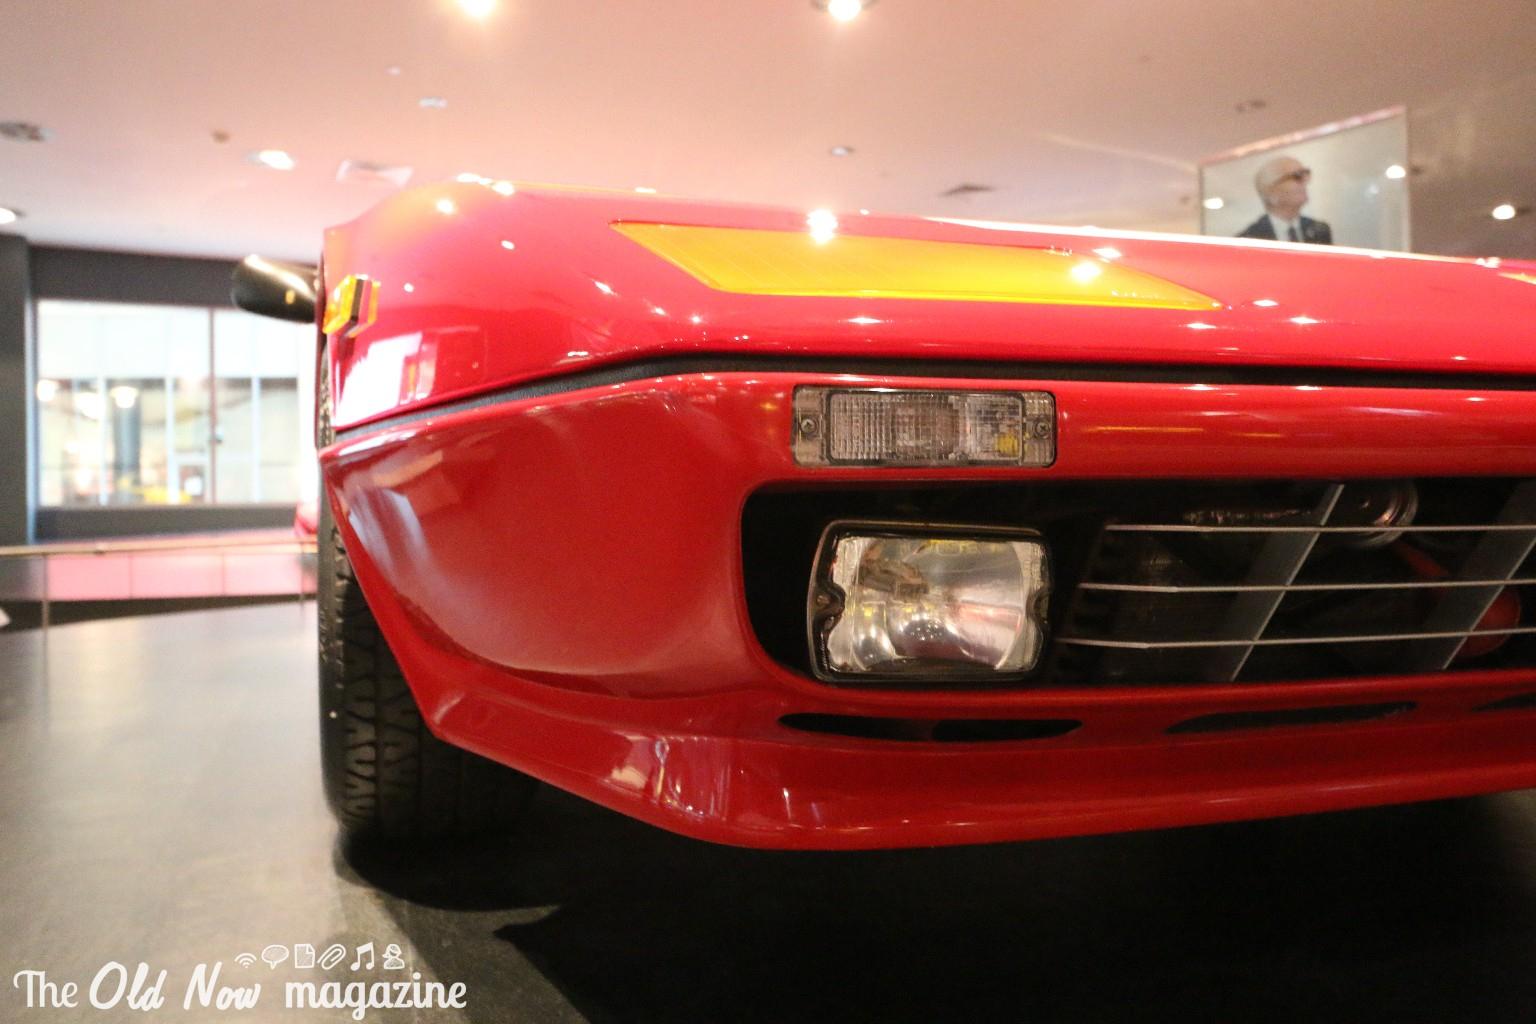 Abu-Dhabi-Ferrari-World-THEOLDNOW-25